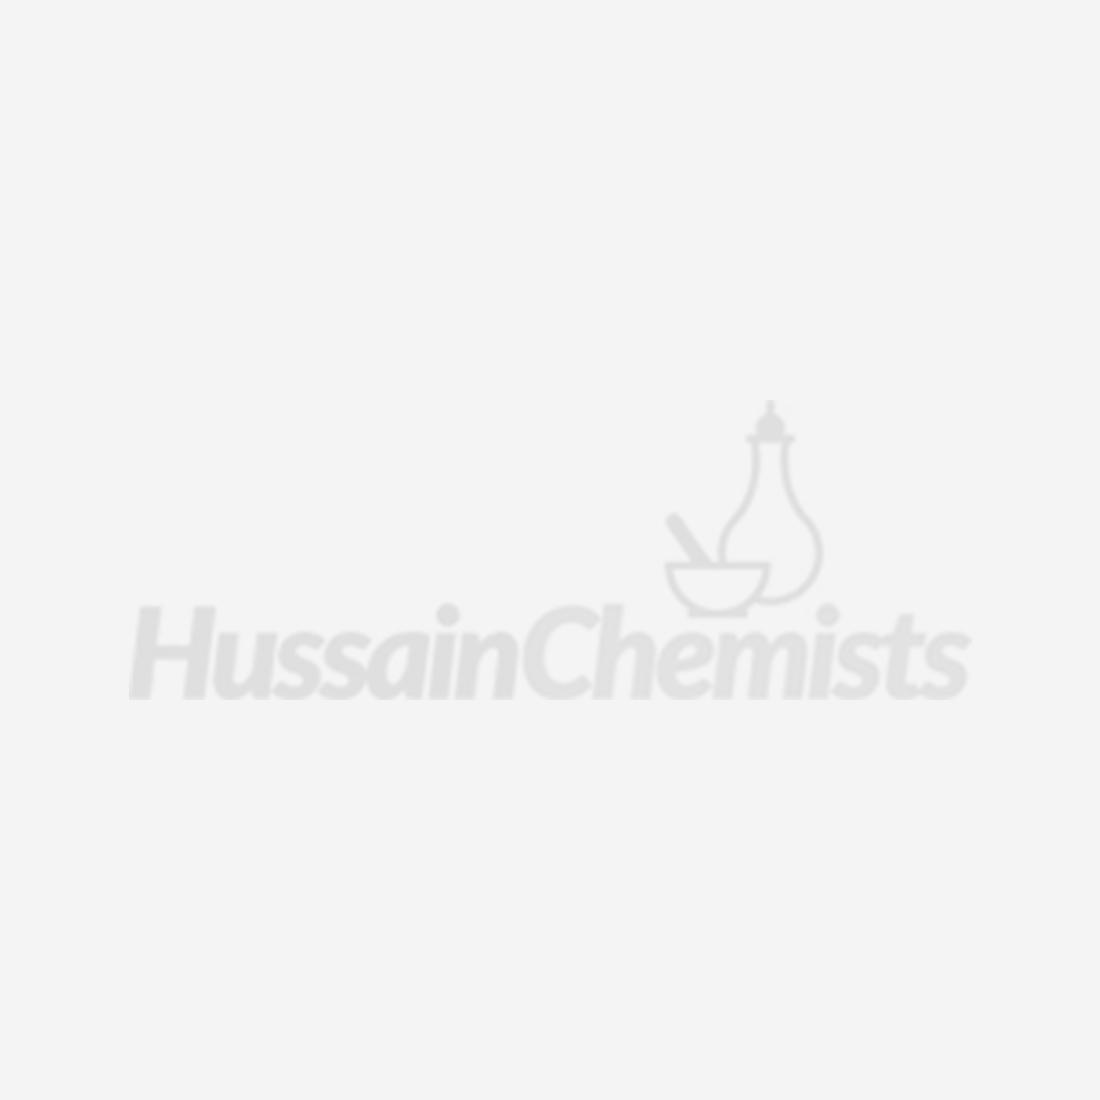 Plantur 39 Phyto-Caffeine Shampoo For Fine Hair 250ml